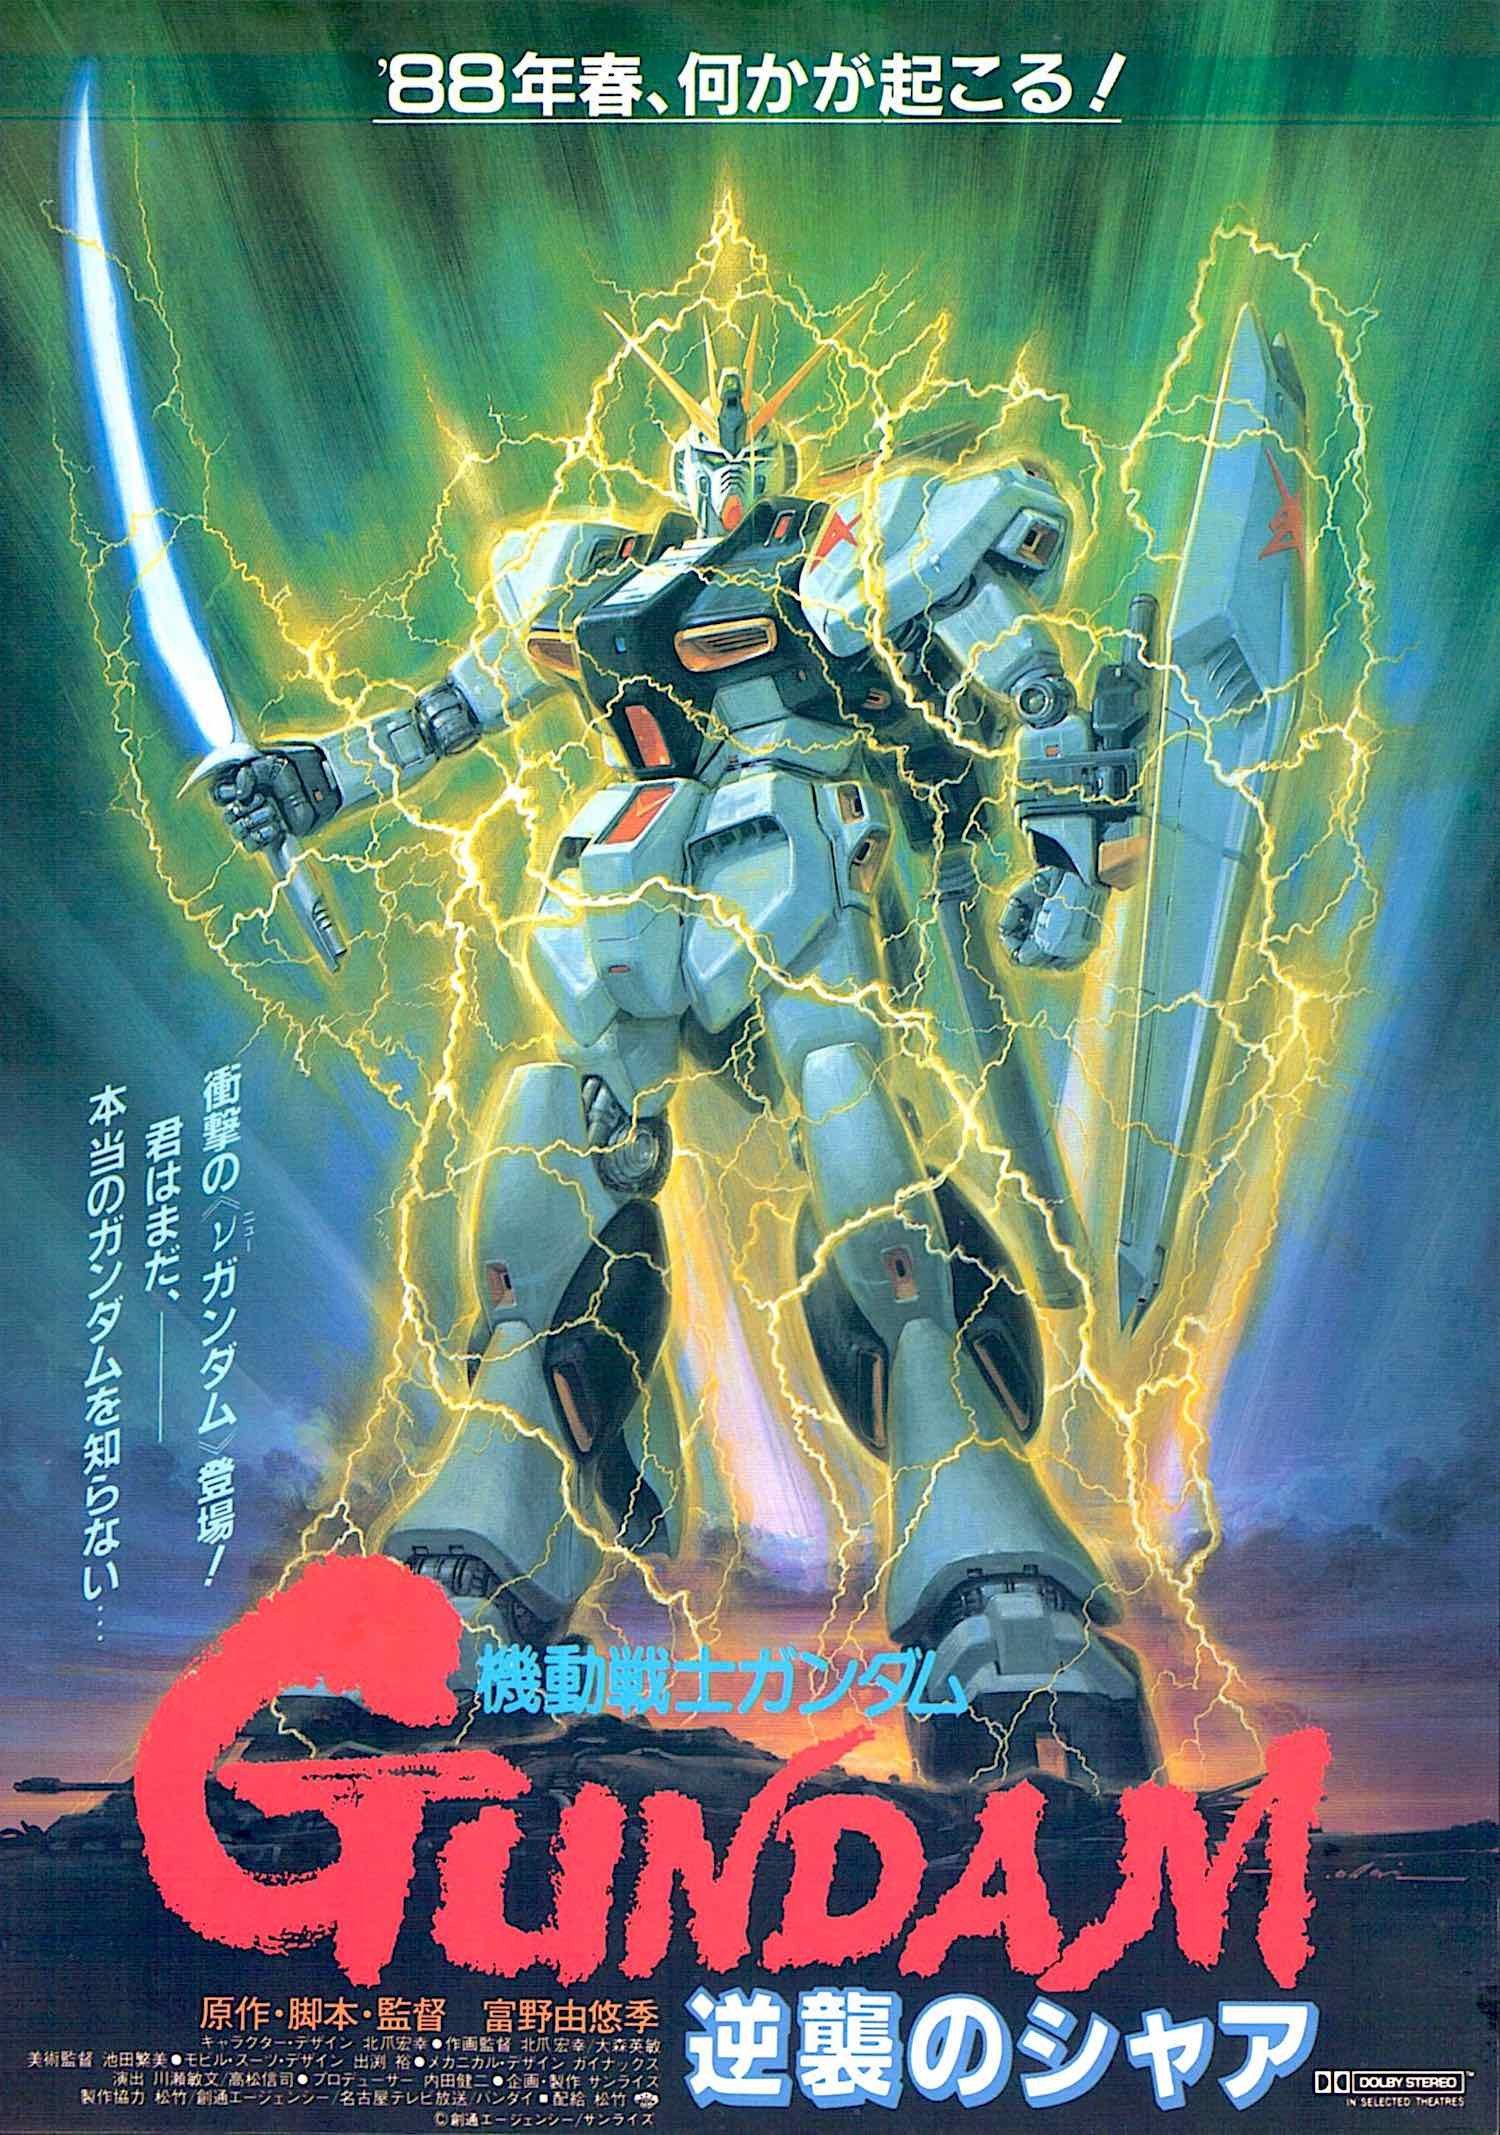 Mobile Suit Gundam Char S Counterattack 80s Anime Classic 1988 Original Print Vintage Japanese Chirashi Film Poster